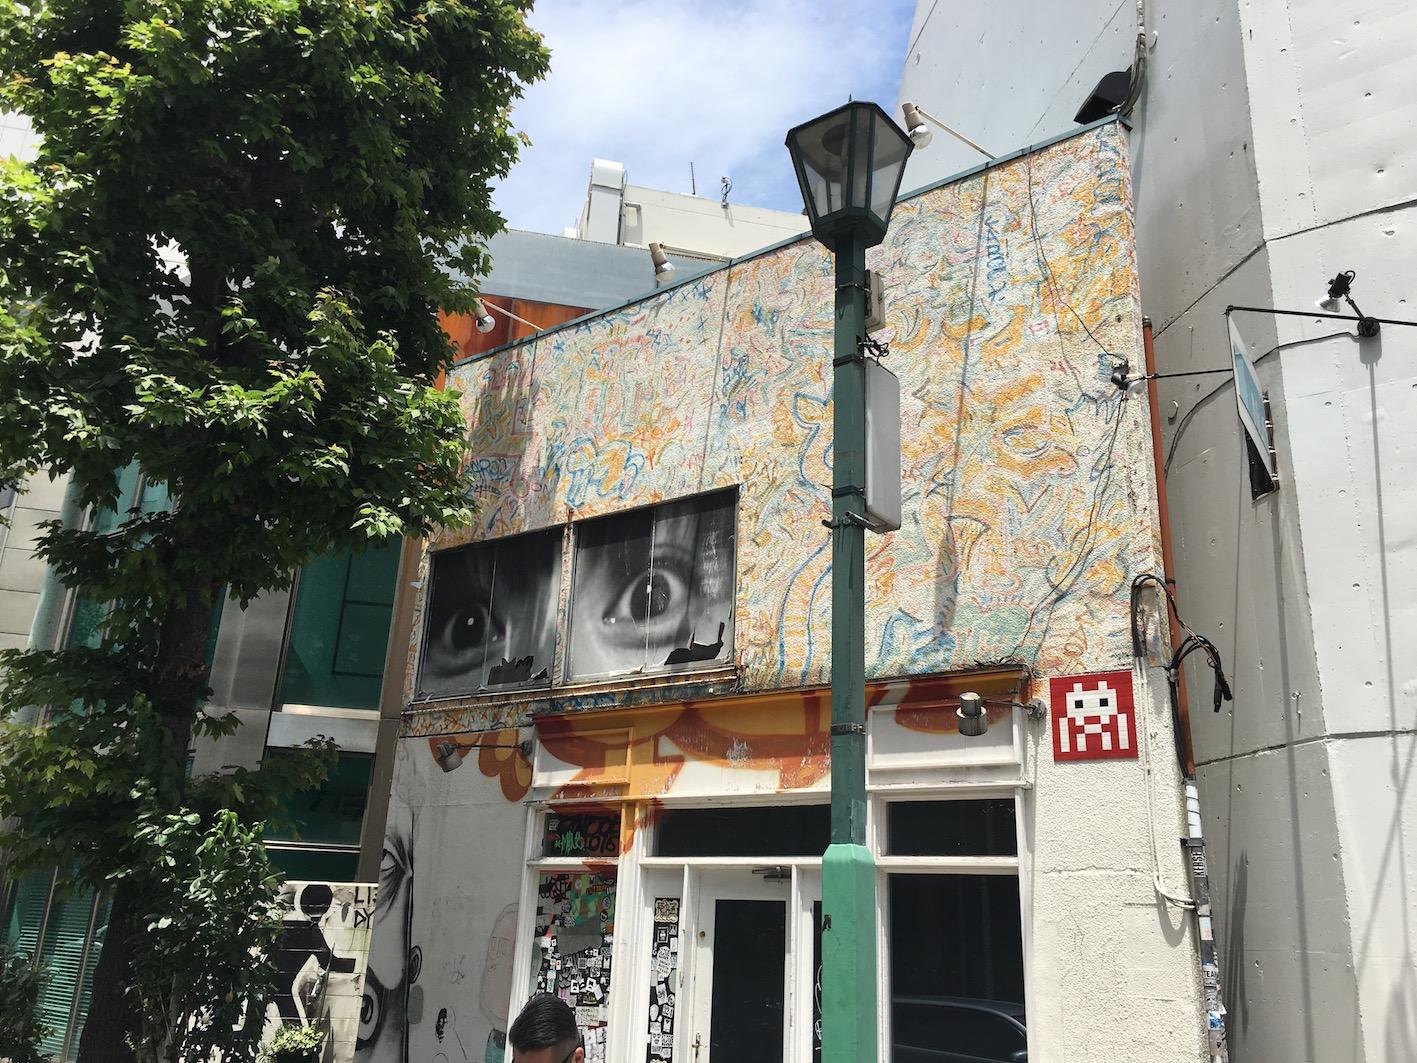 deansunshine_landofsunshine_melbourne_streetart_graffiti_tokyo invader 6